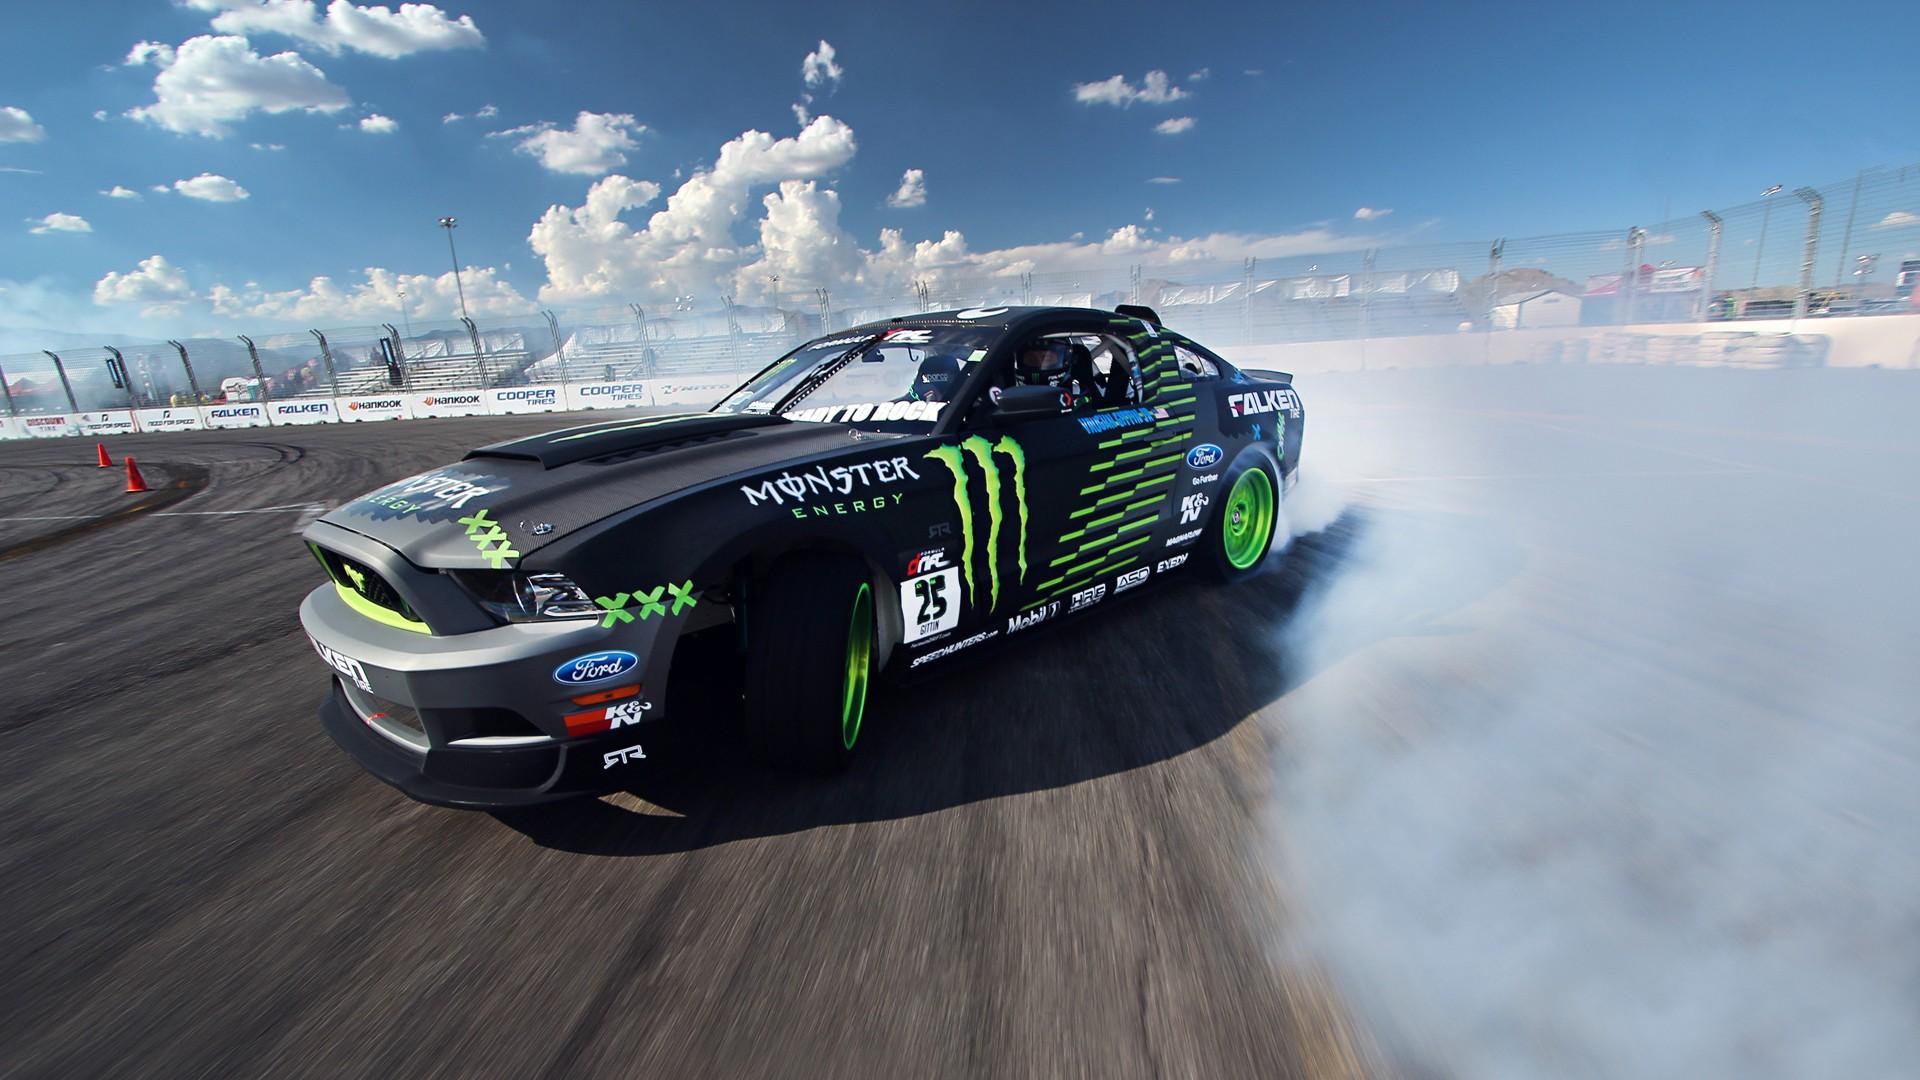 Wallpaper Sports Vehicle Ford Mustang Drifting Drift Monster